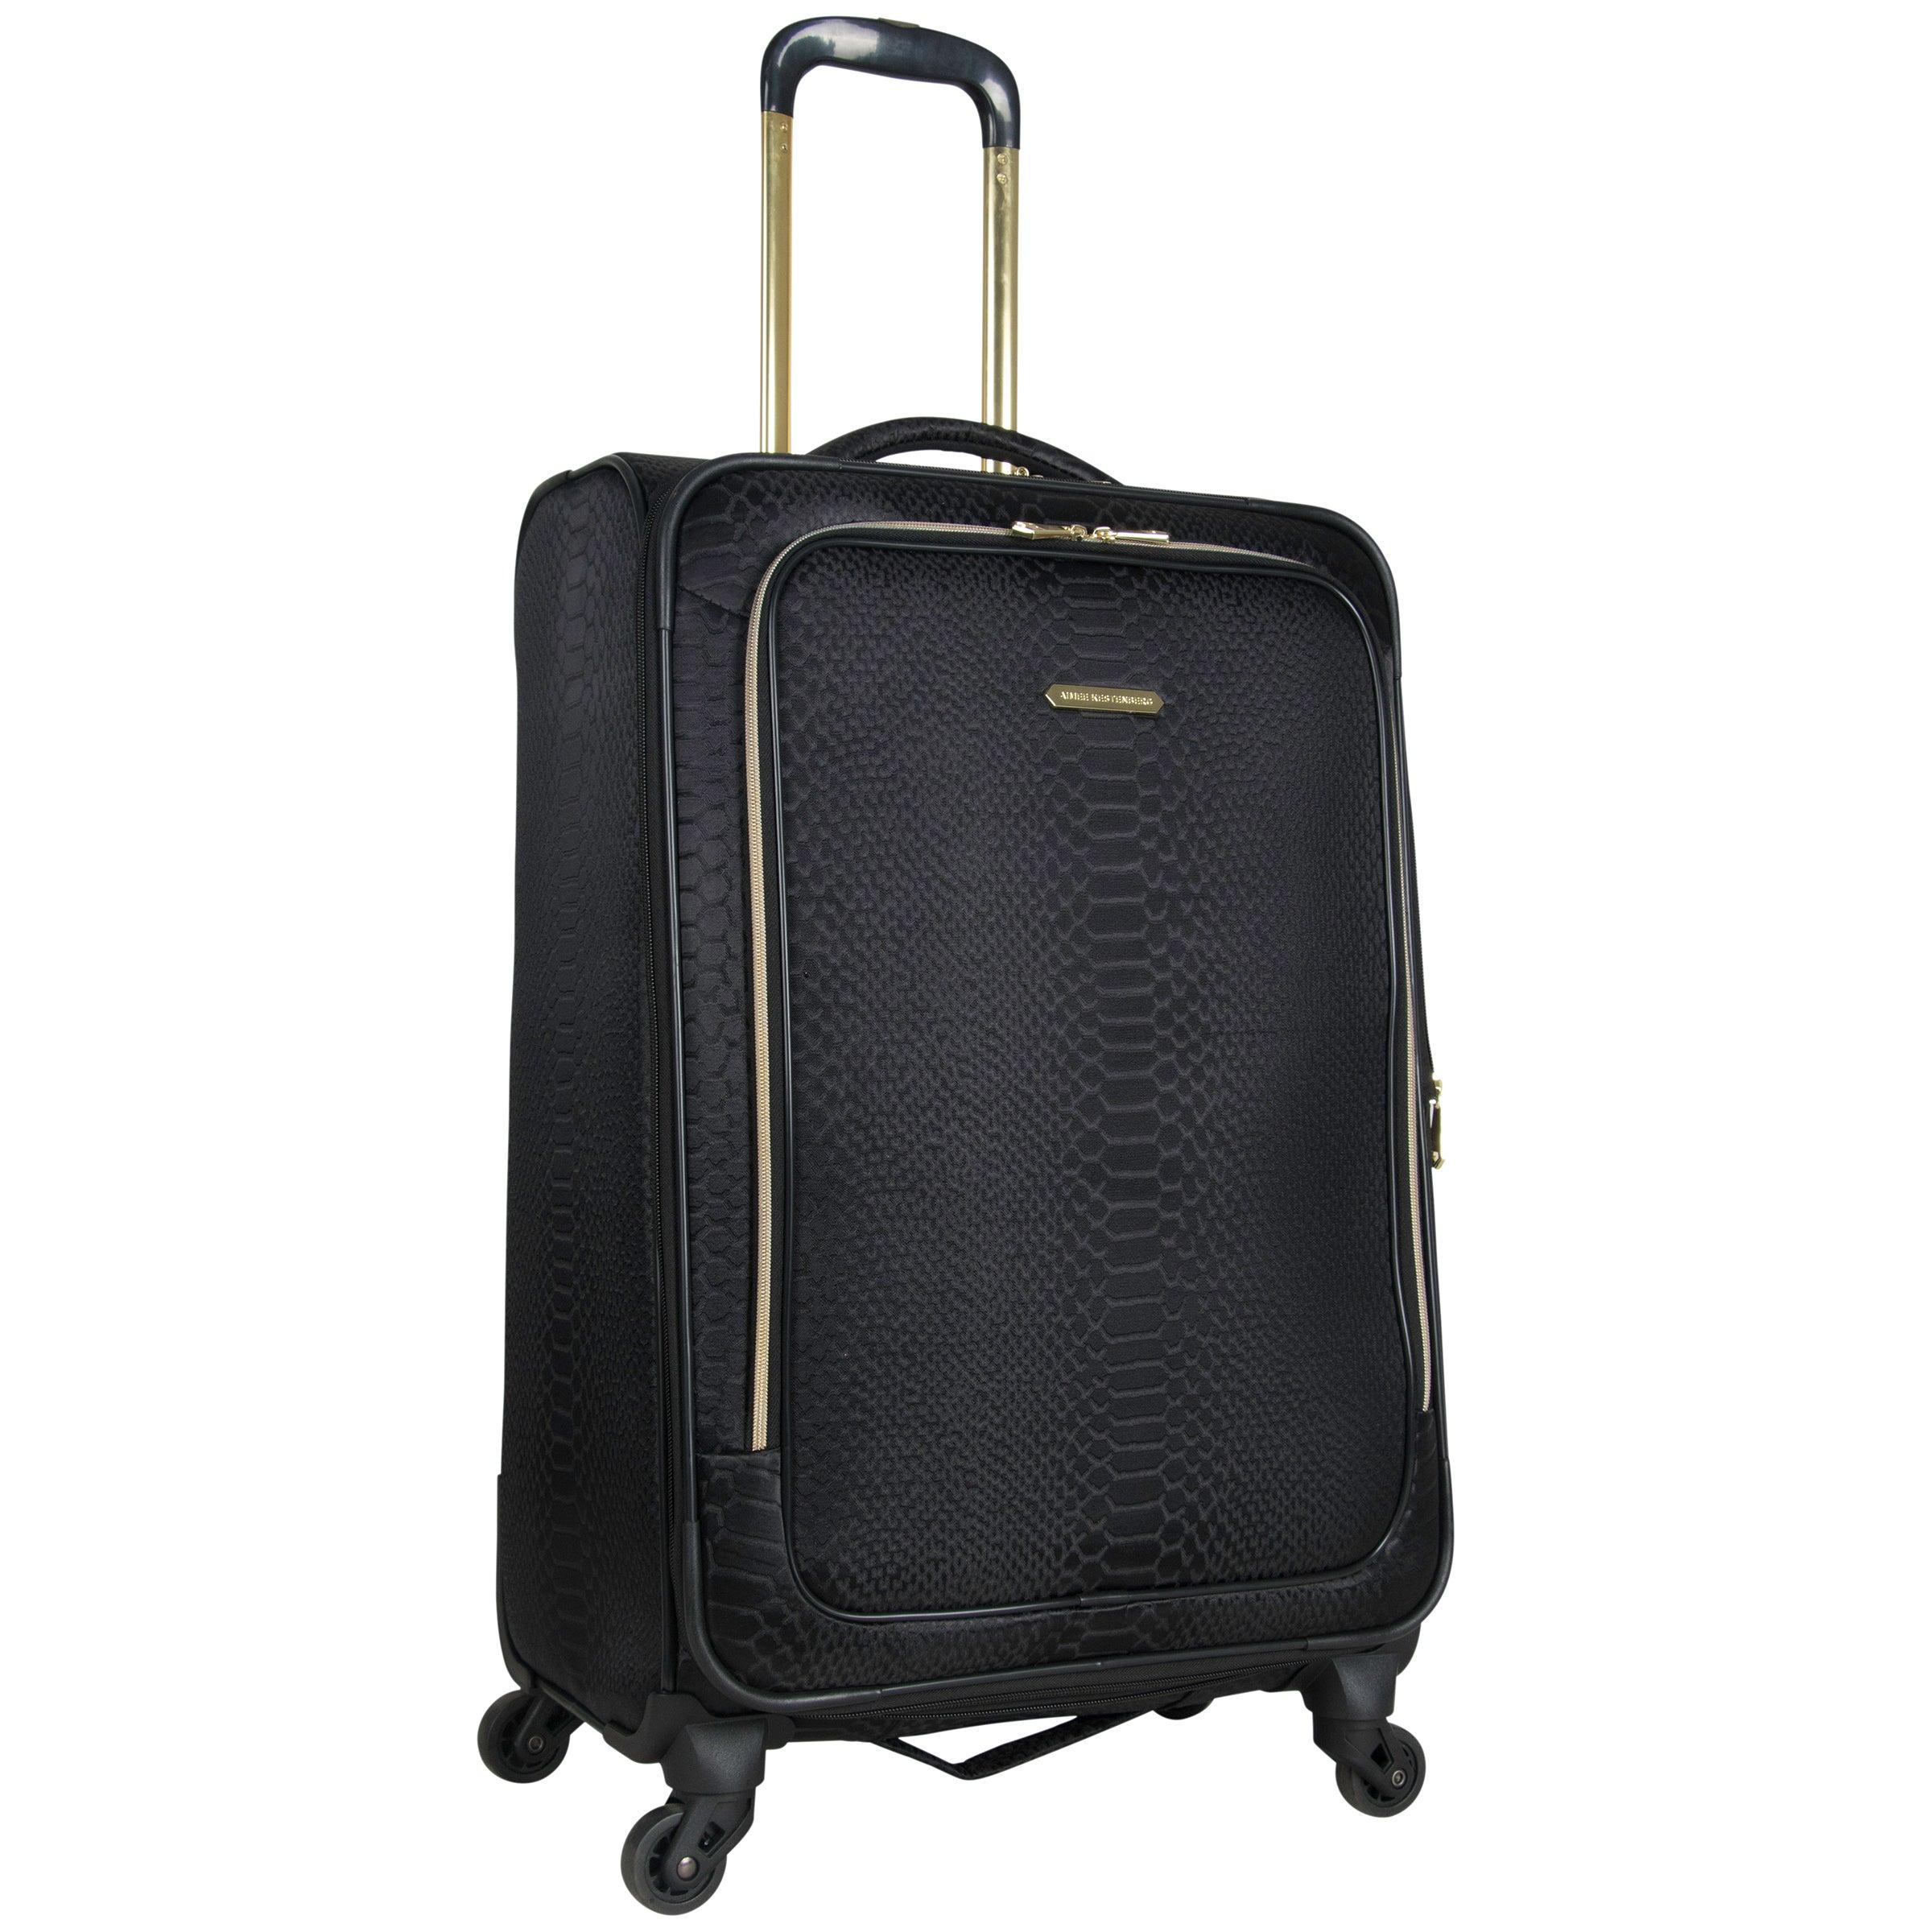 Large Suitcase Dimensions